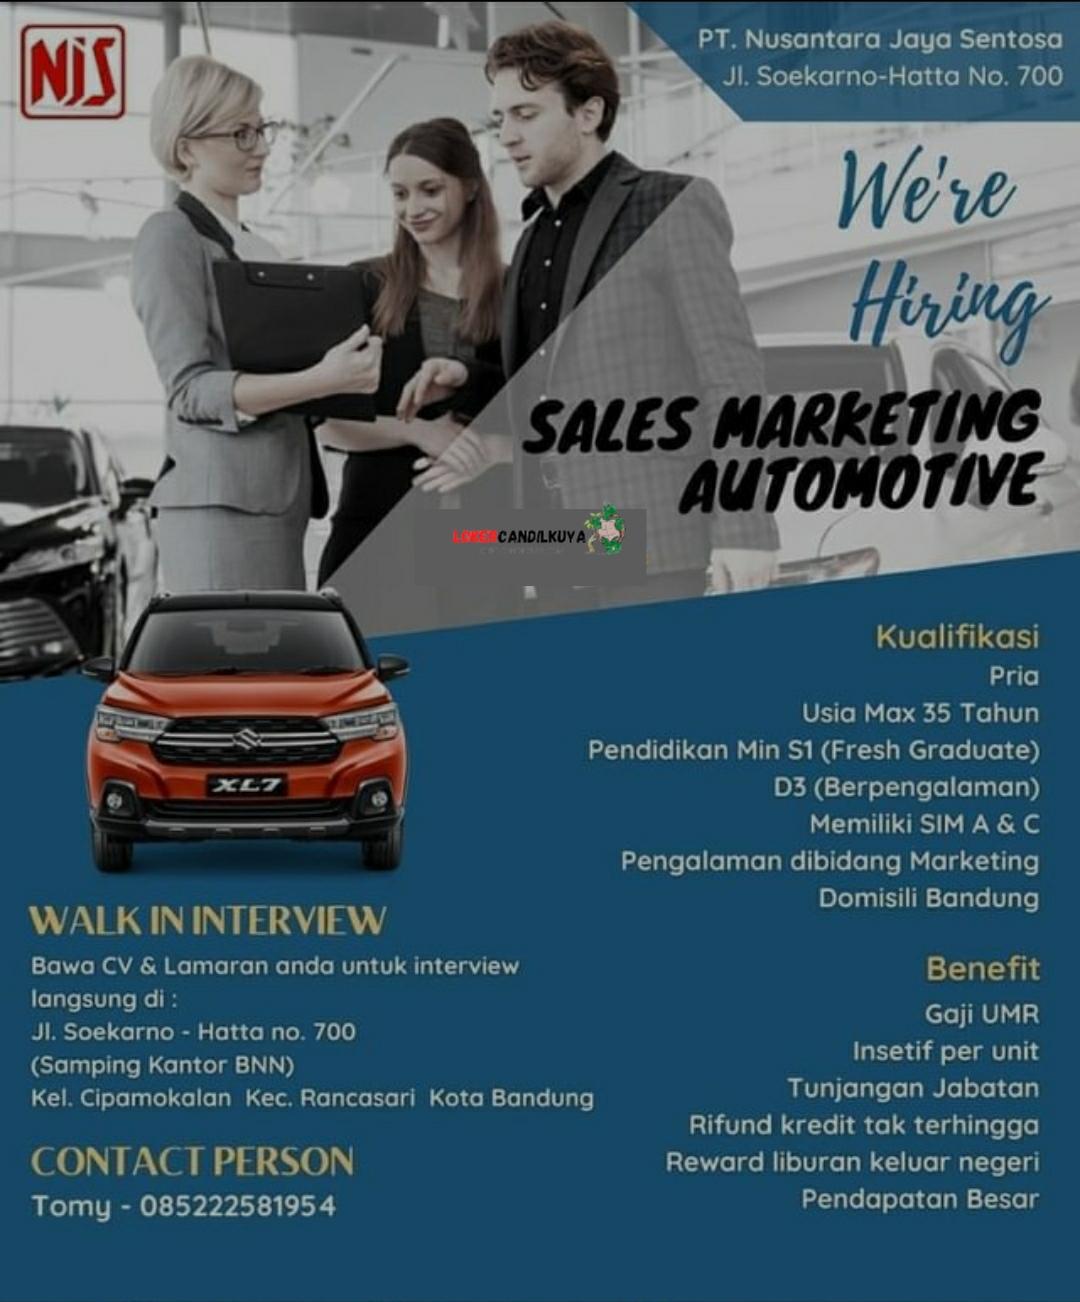 Lowongan Kerja Sales Marketing Automotive Bandung